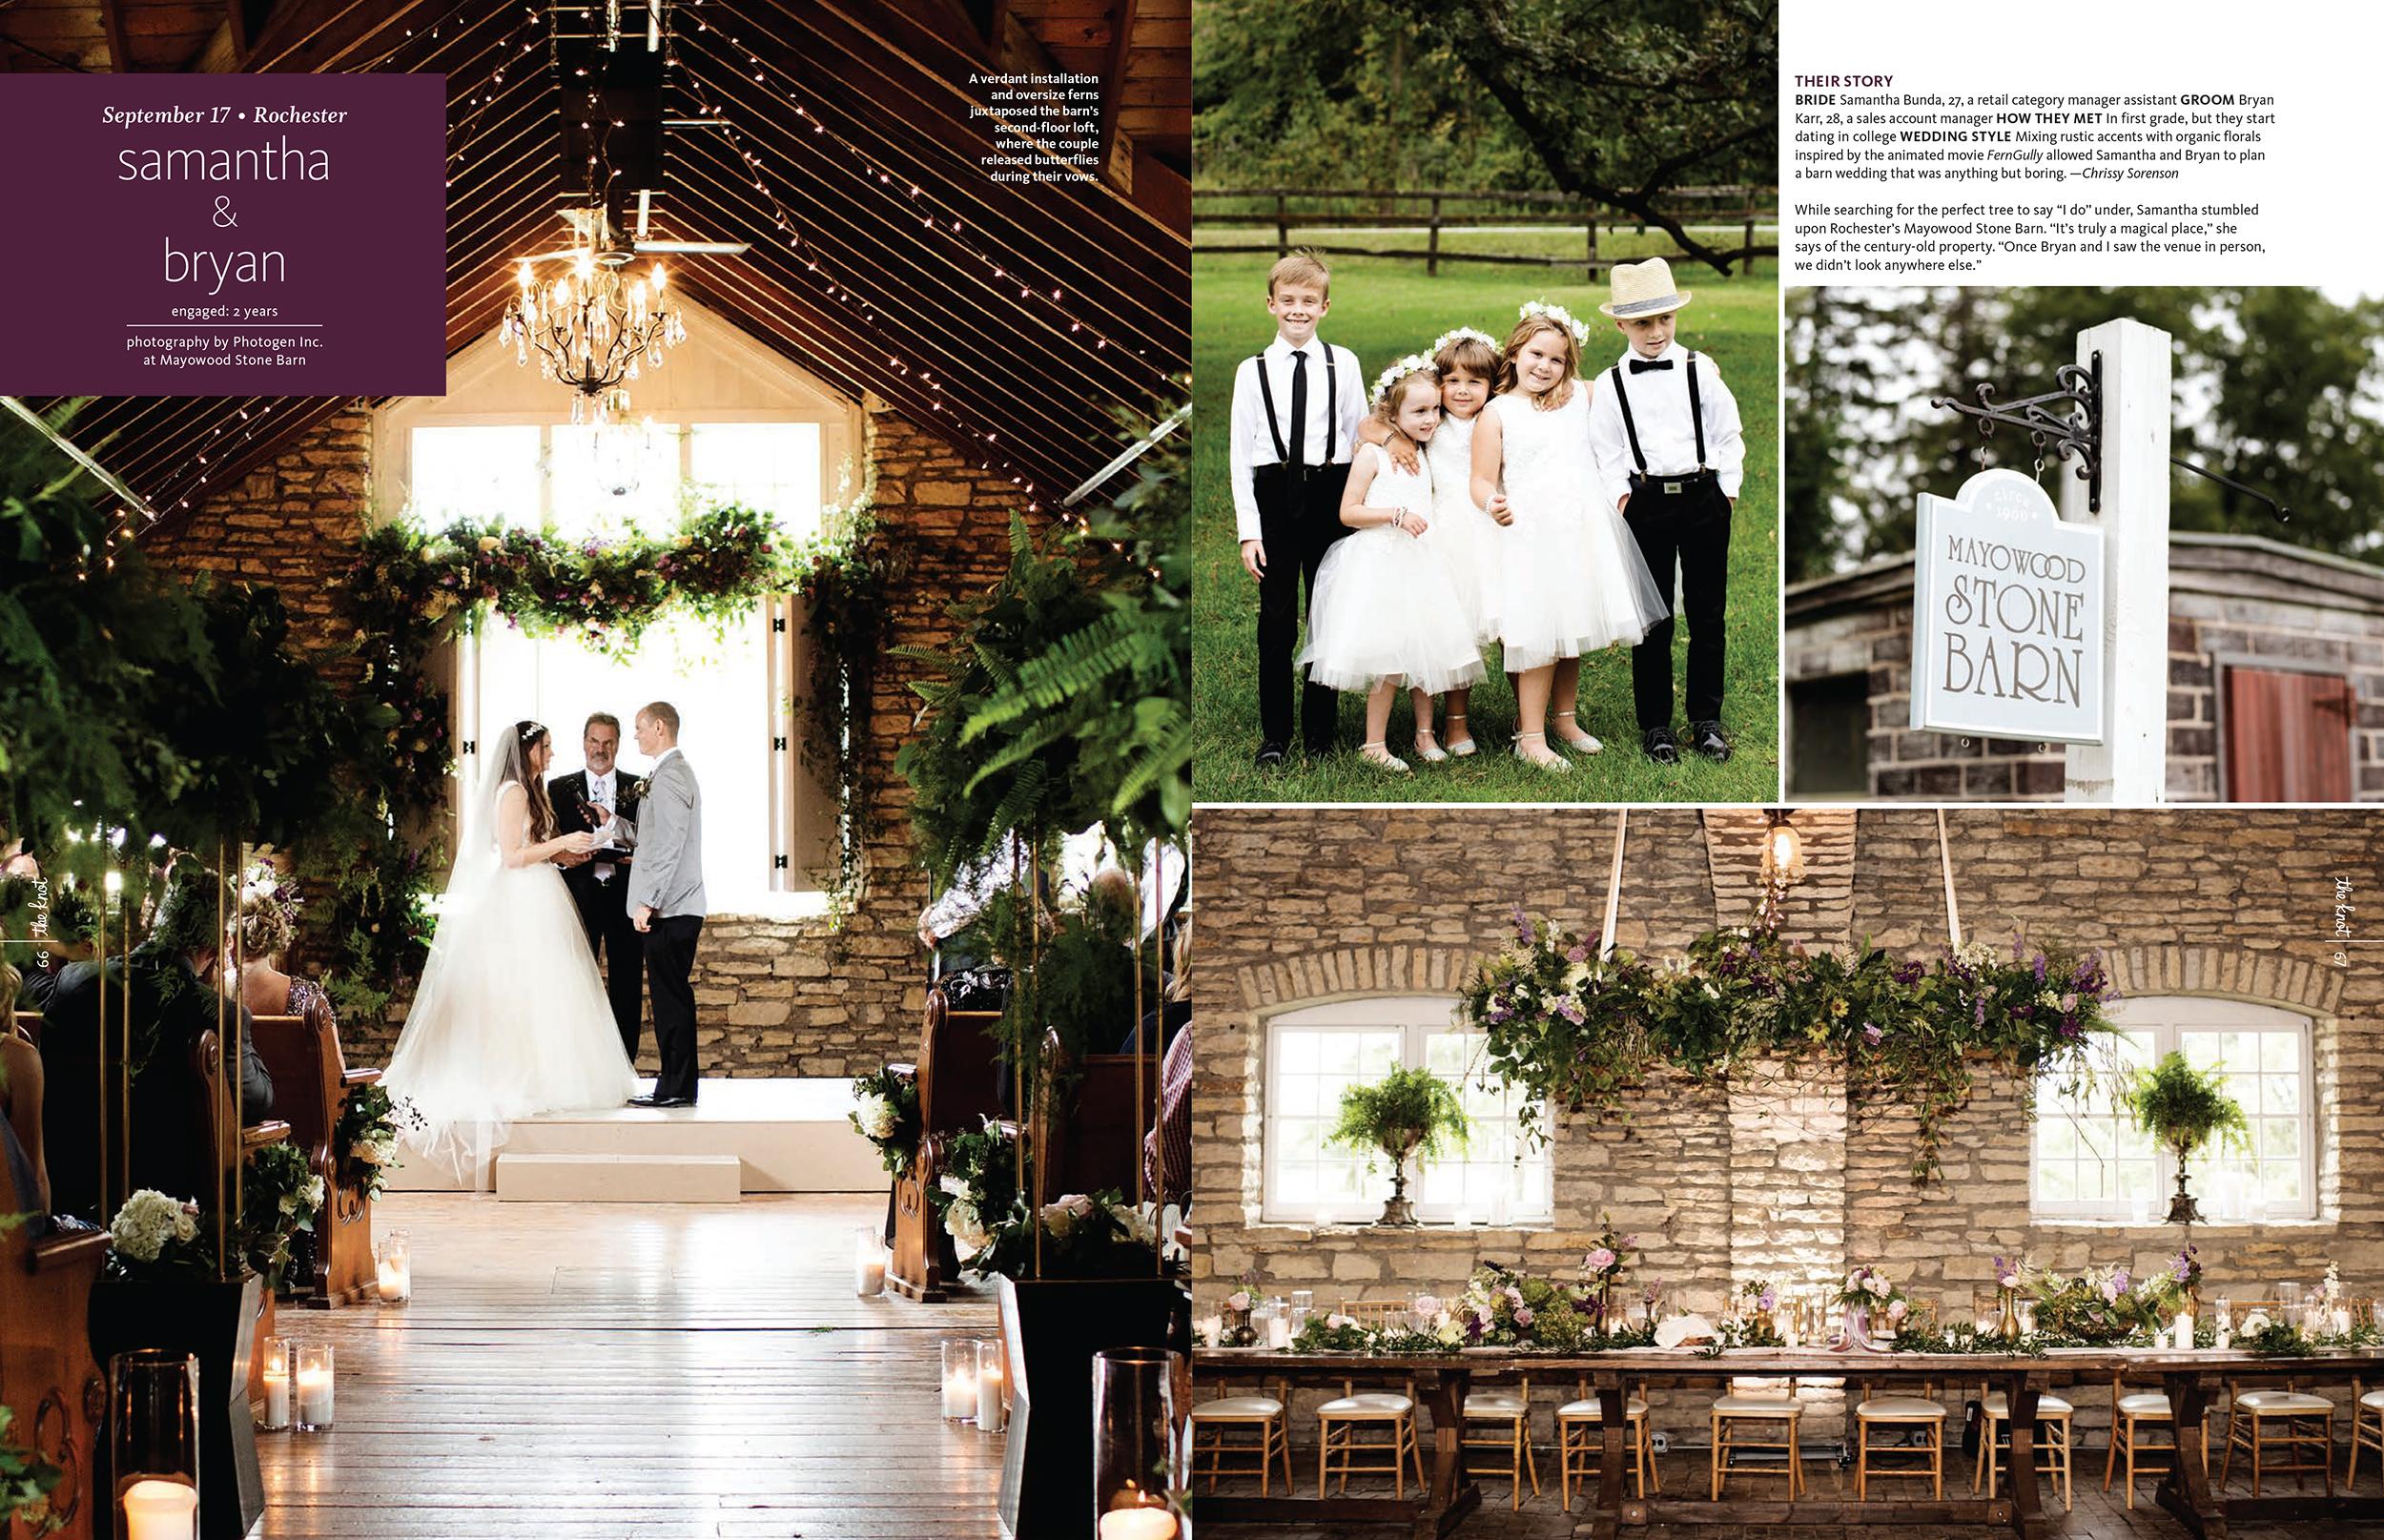 Mayowood Stone Barn Wedding Rochester, MN | Photos by Photogen Inc. | Eliesa Johnson | Based in Minneapolis, Minnesota